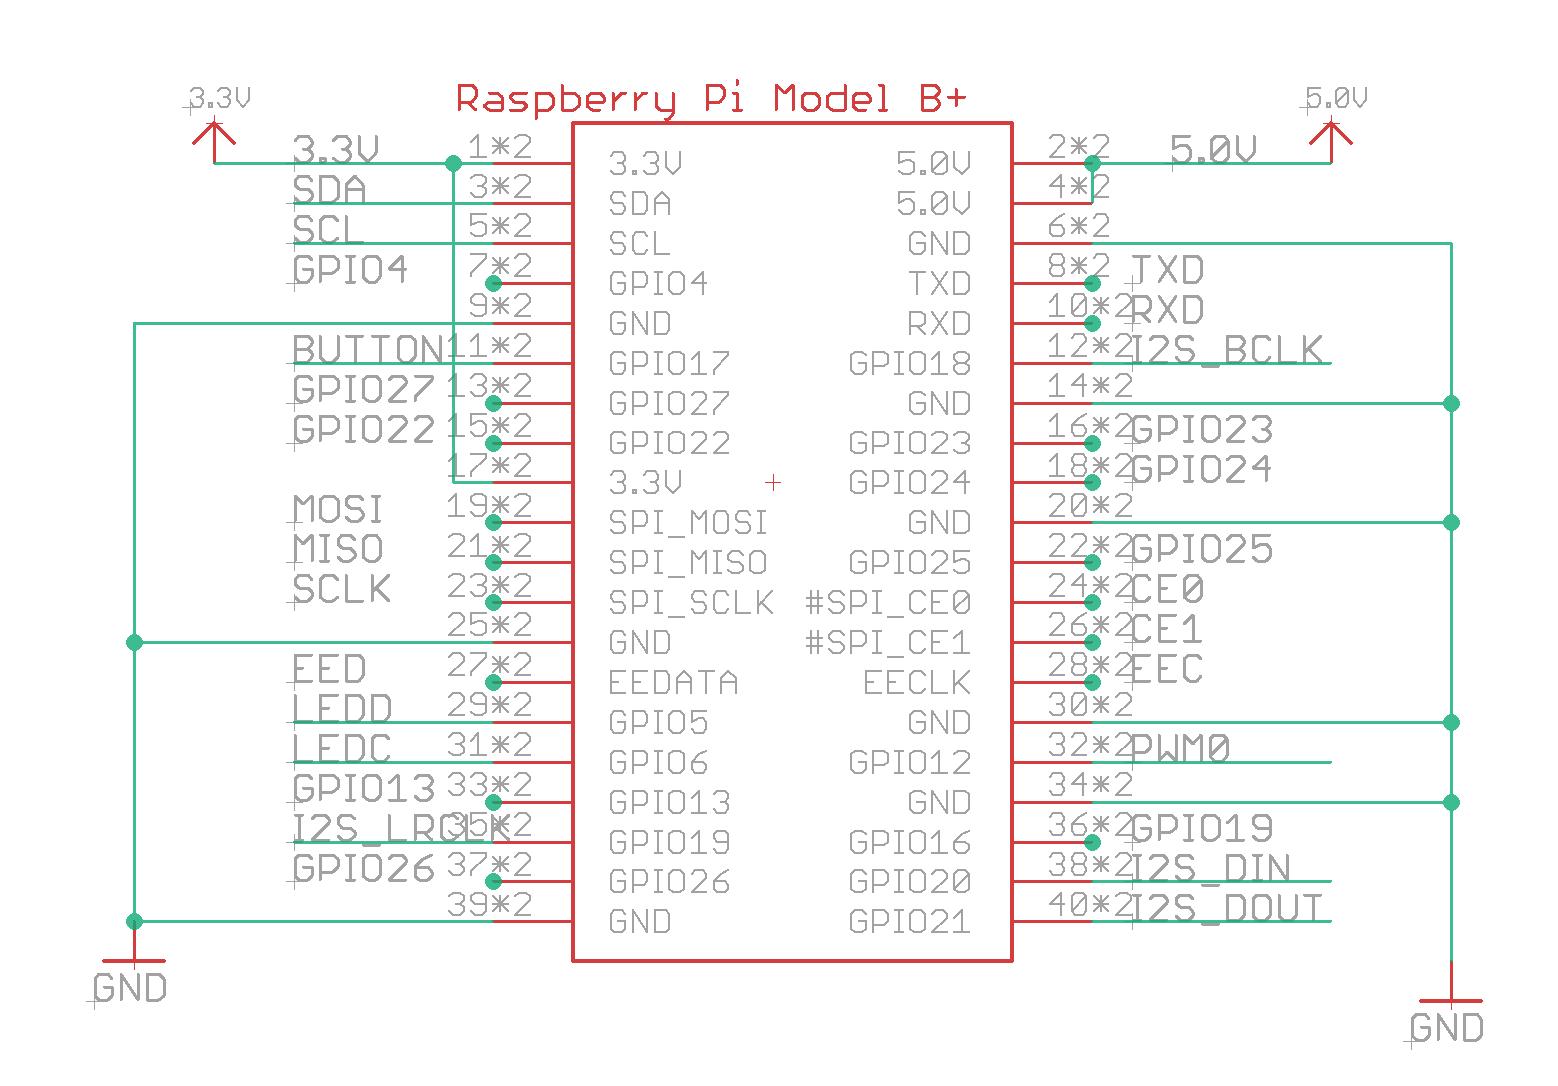 adafruit_products_Voice_Bonnet_RasPi_pinouts_schematic.png